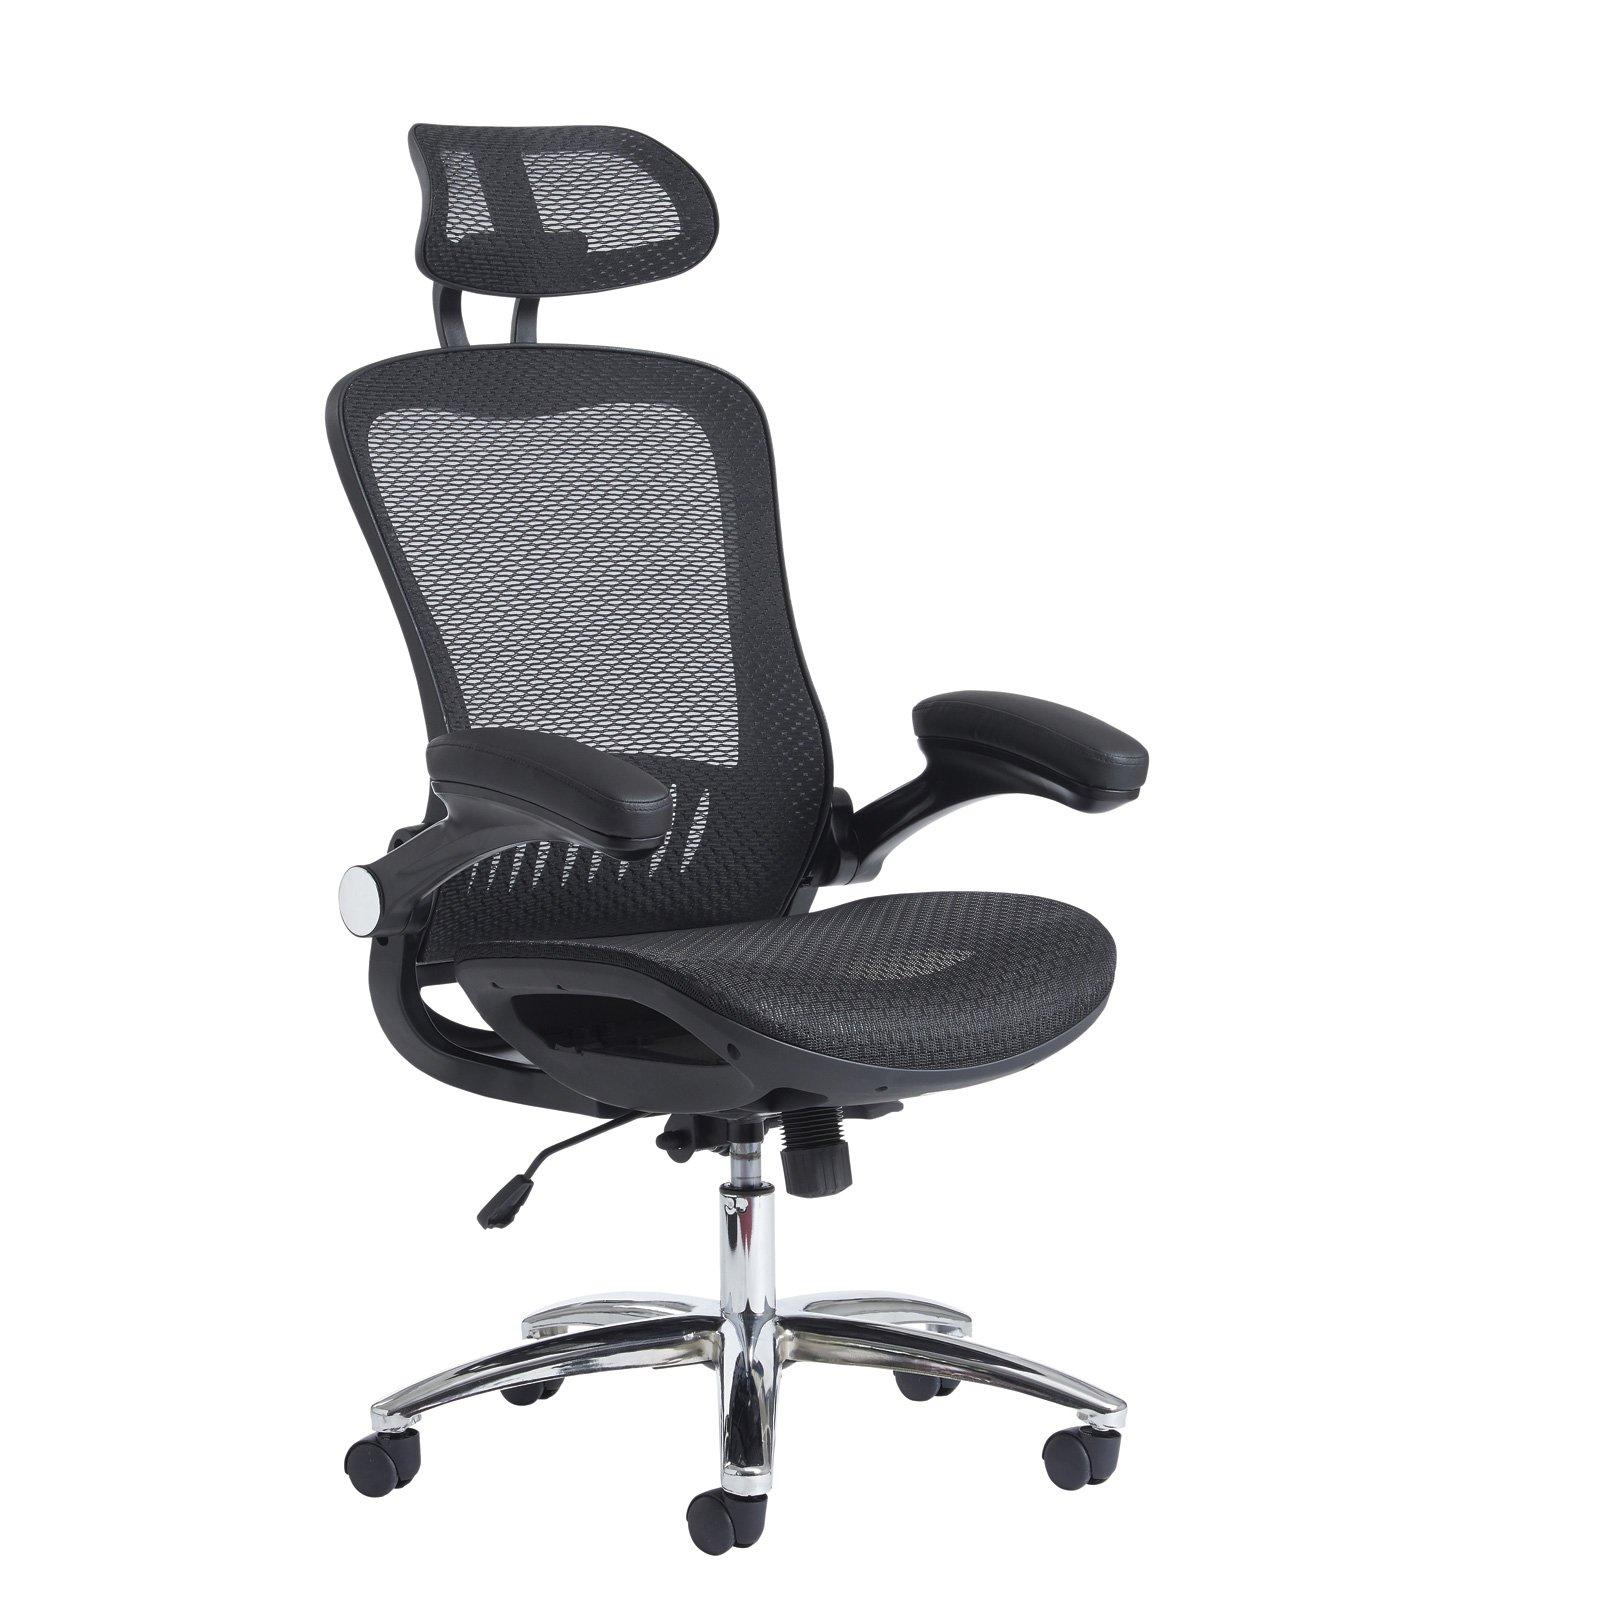 curva high back mesh chair black. Black Bedroom Furniture Sets. Home Design Ideas